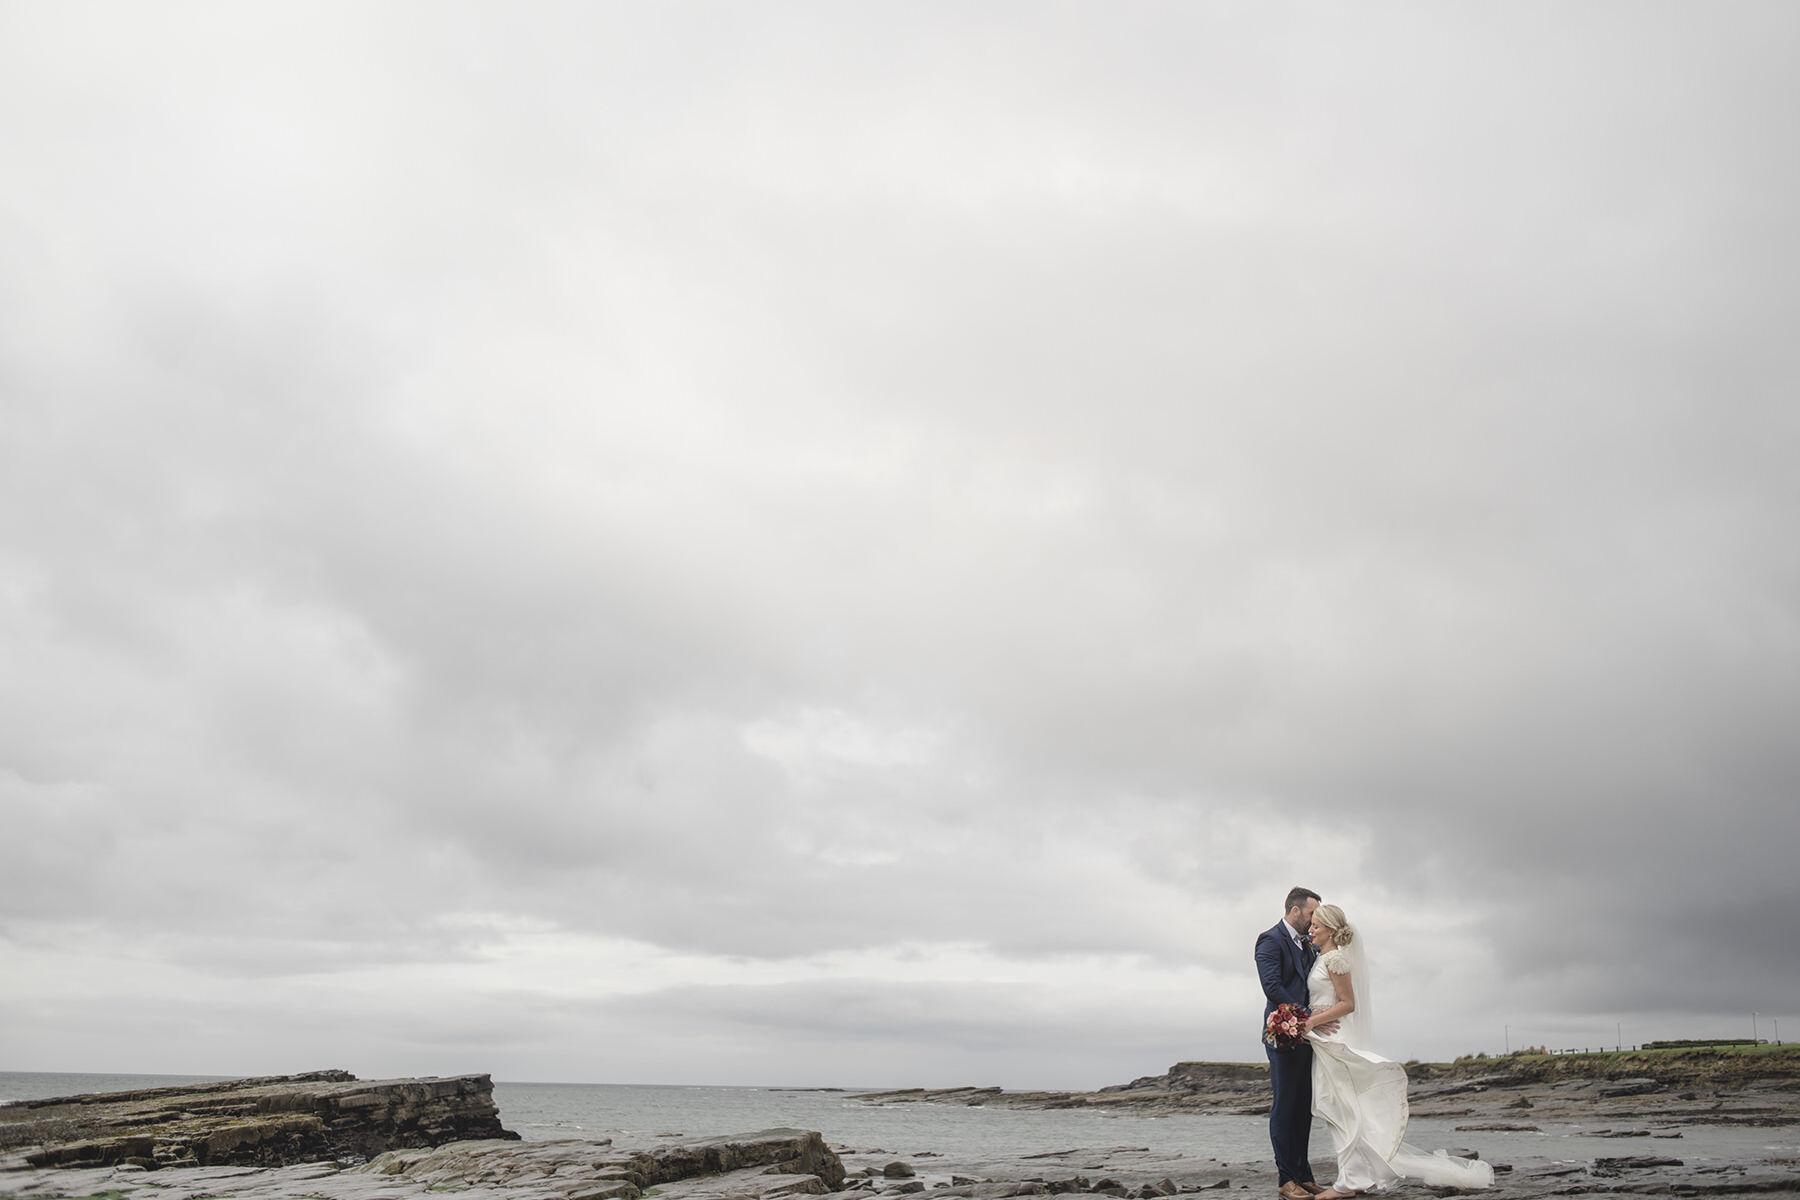 M + R | West Ireland Wedding 29